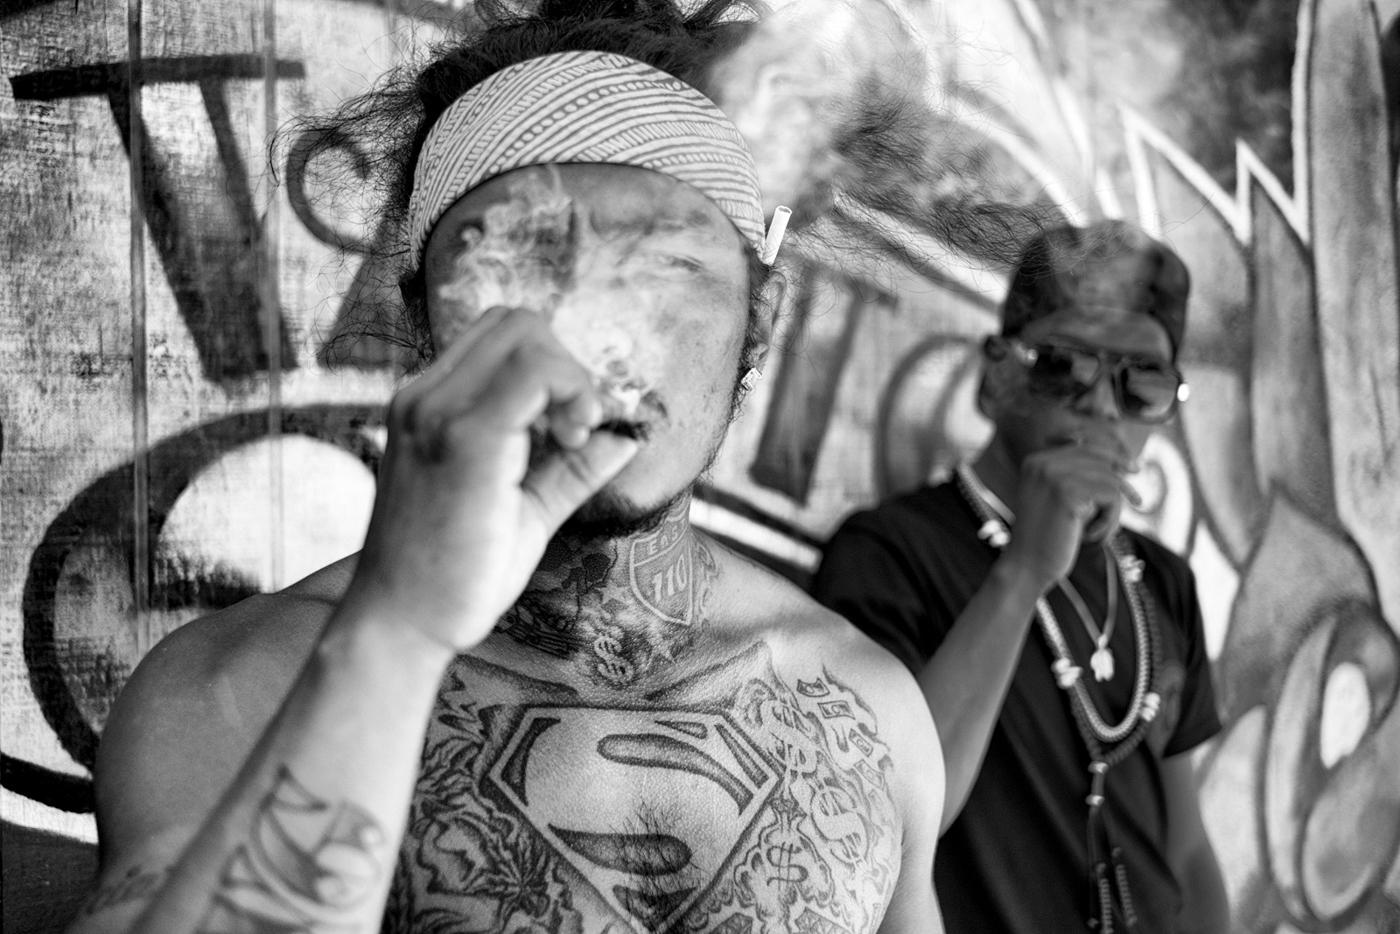 Smoking by the Boardwalk © Dotan Saguy